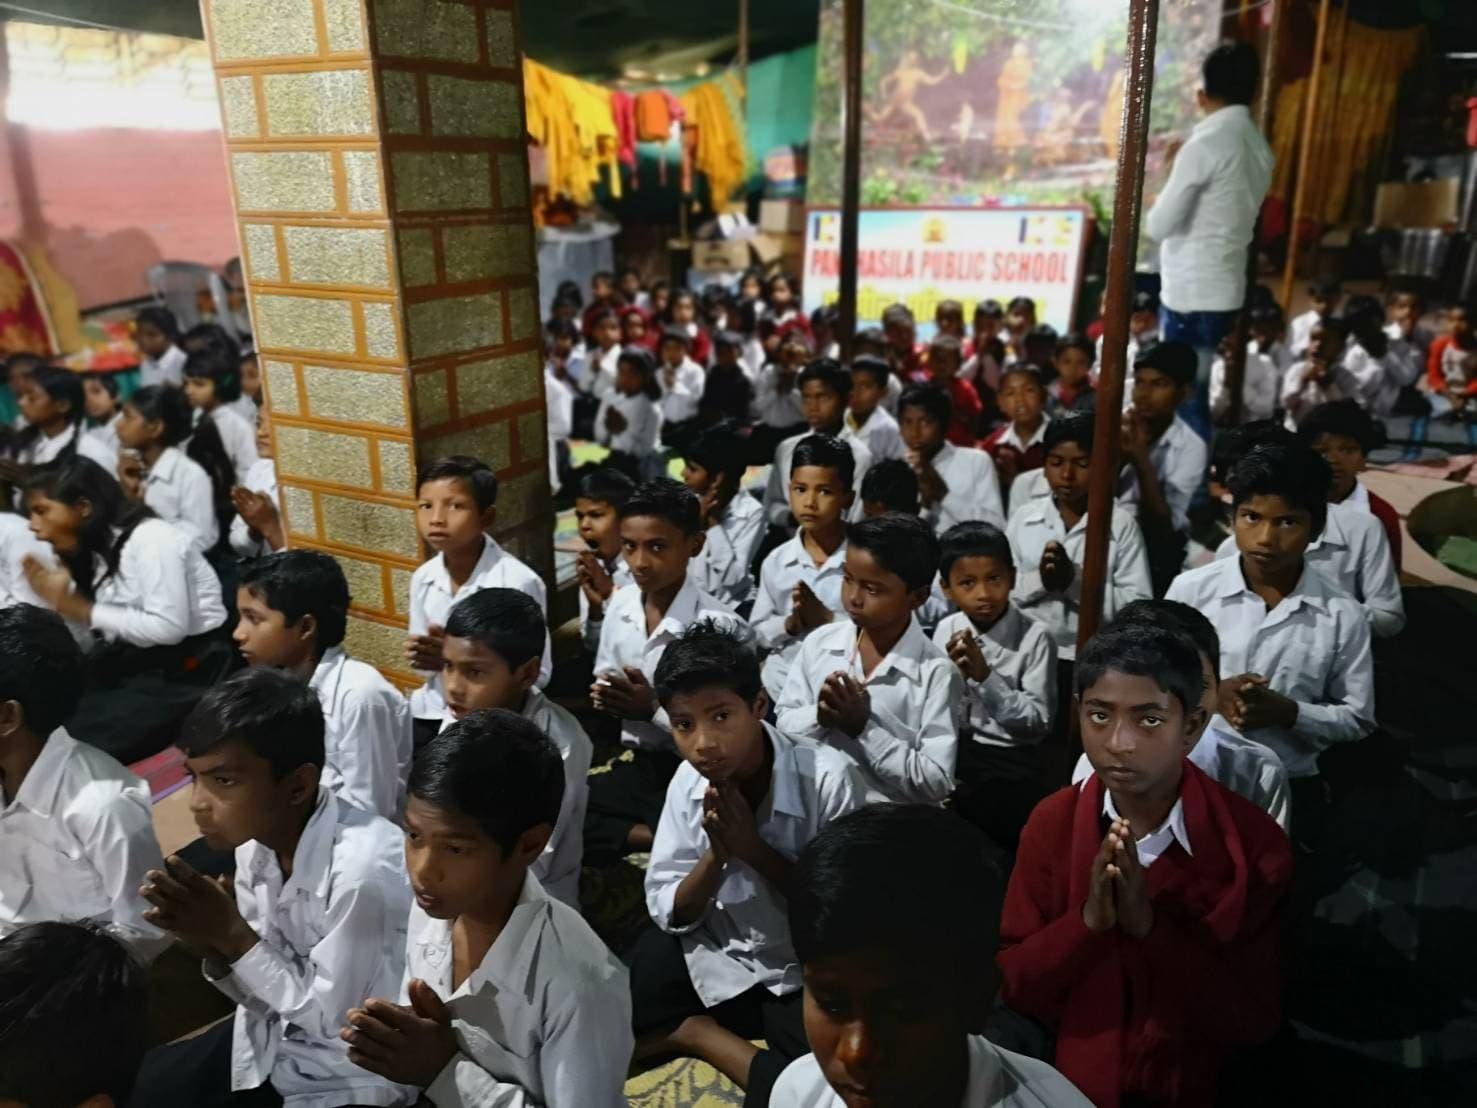 School charity project